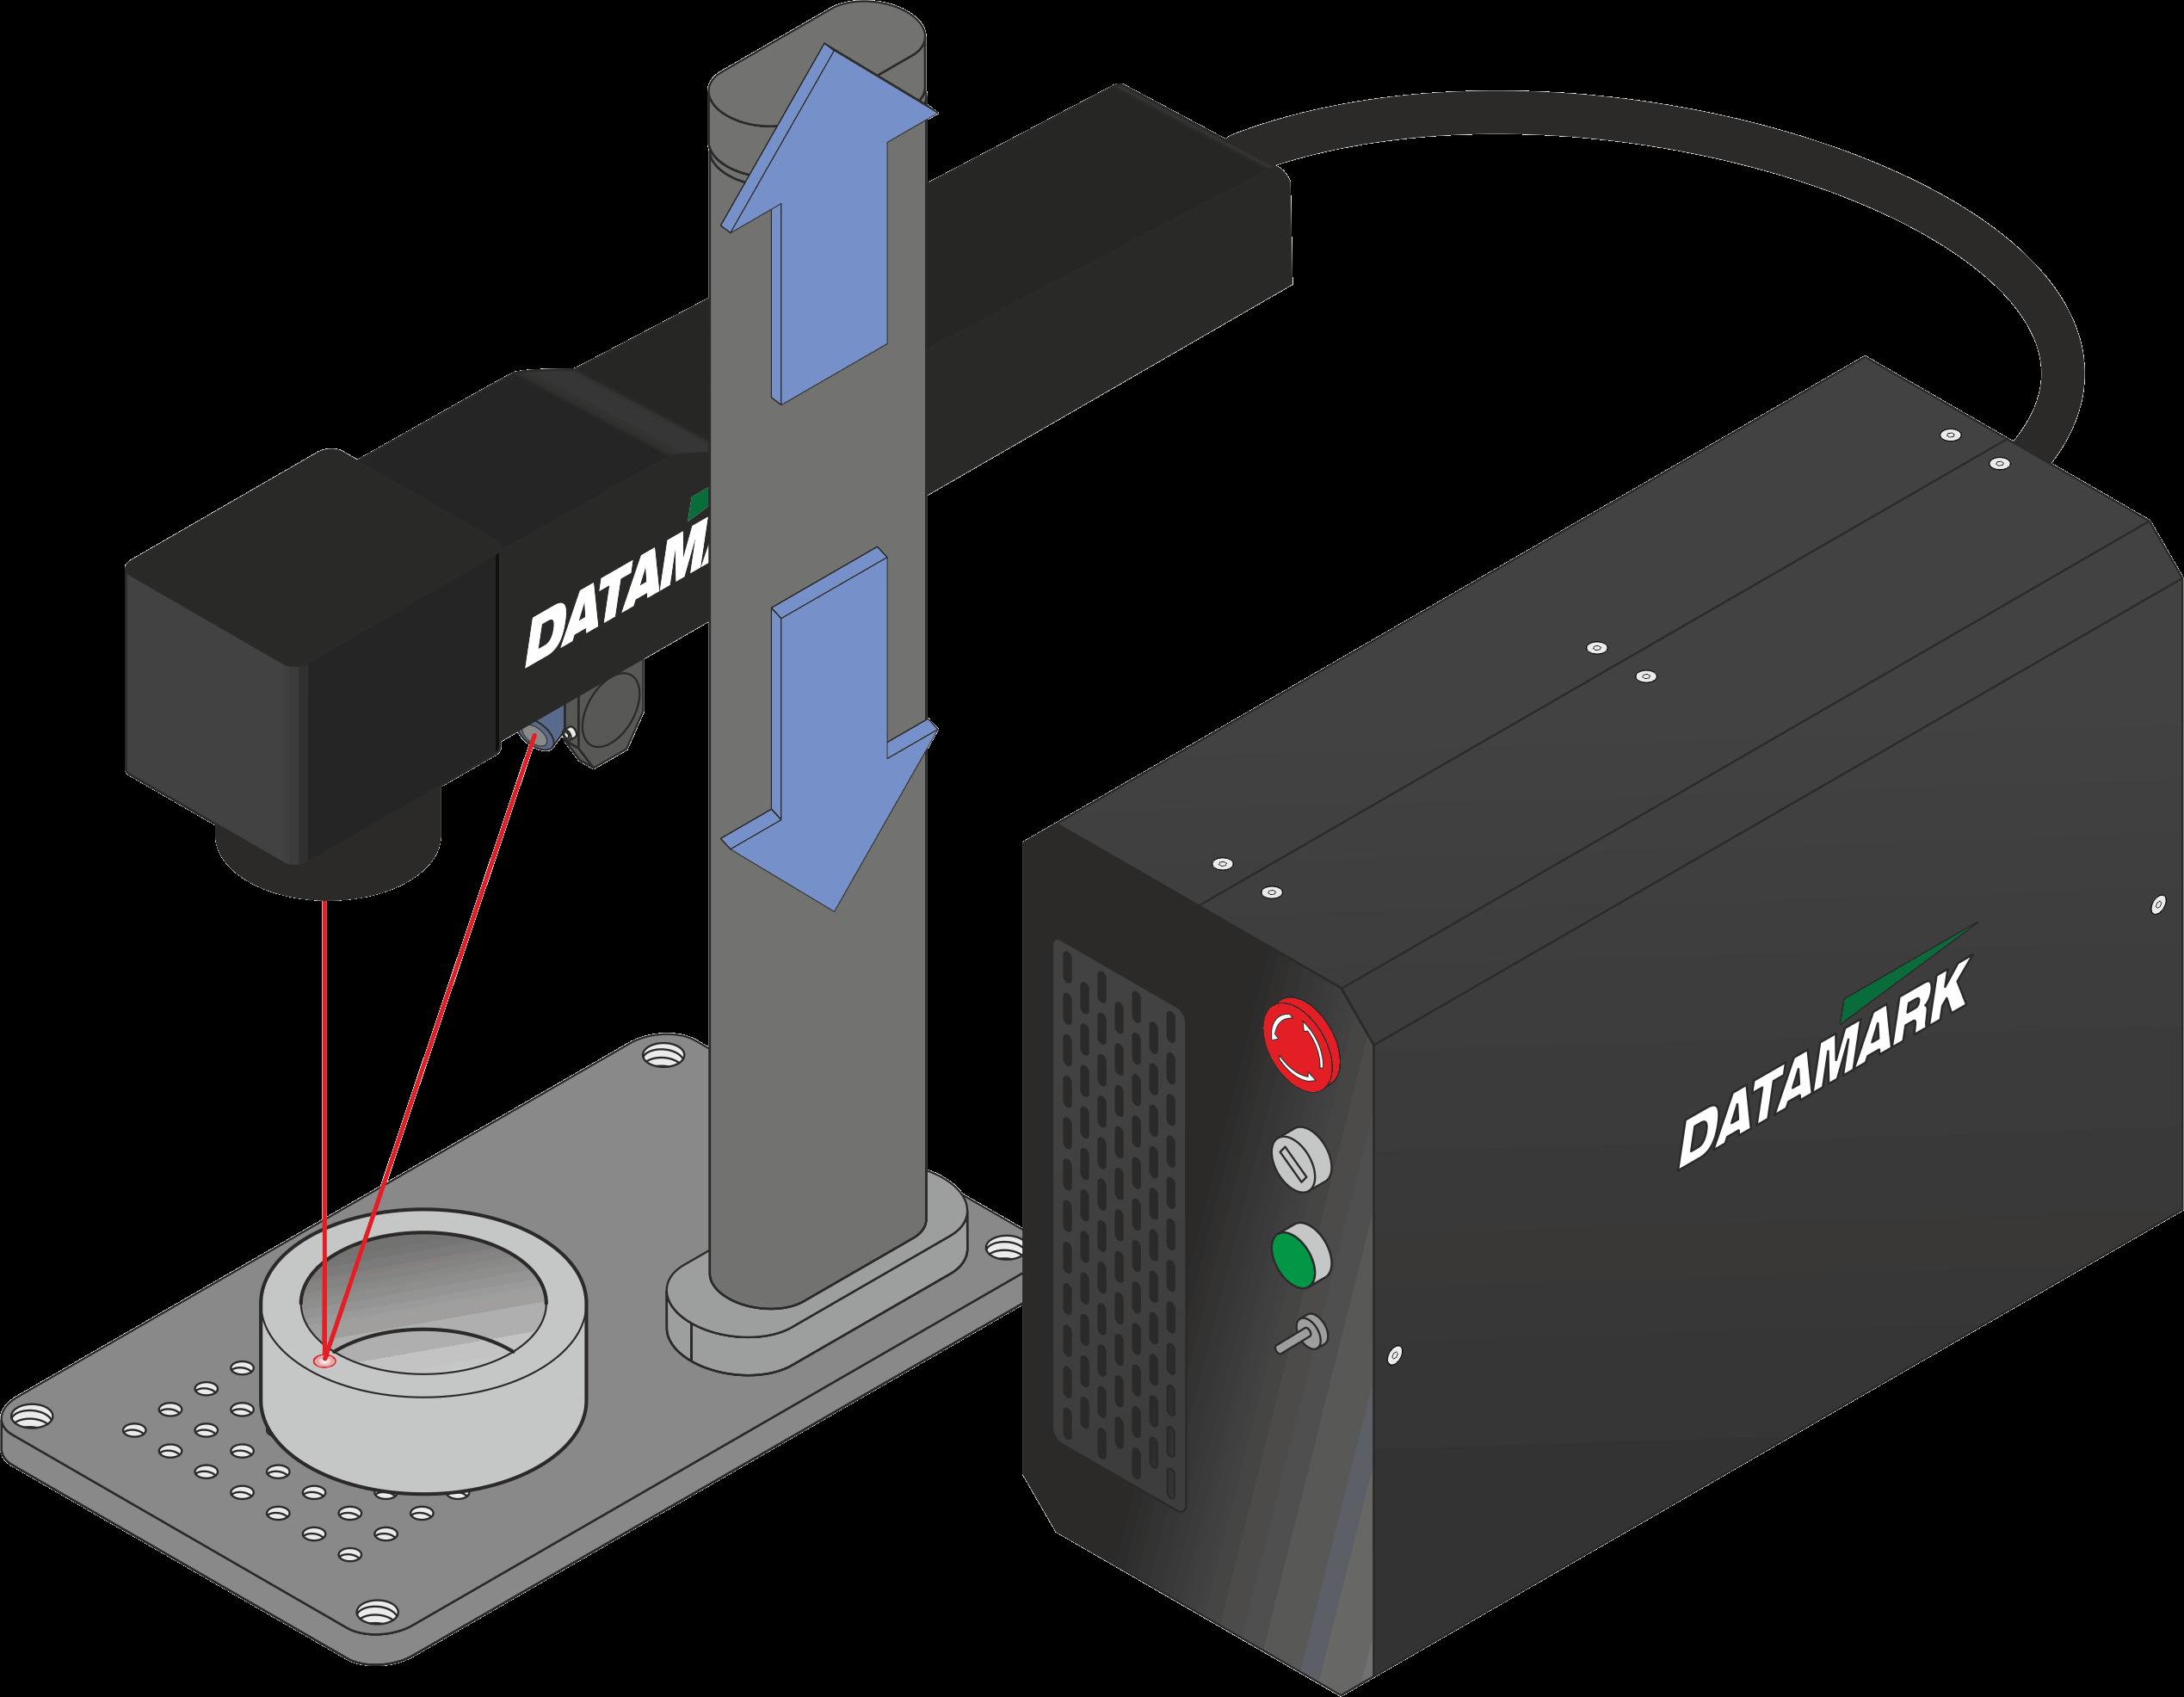 Máquina de grabado láser Datamark ML-200